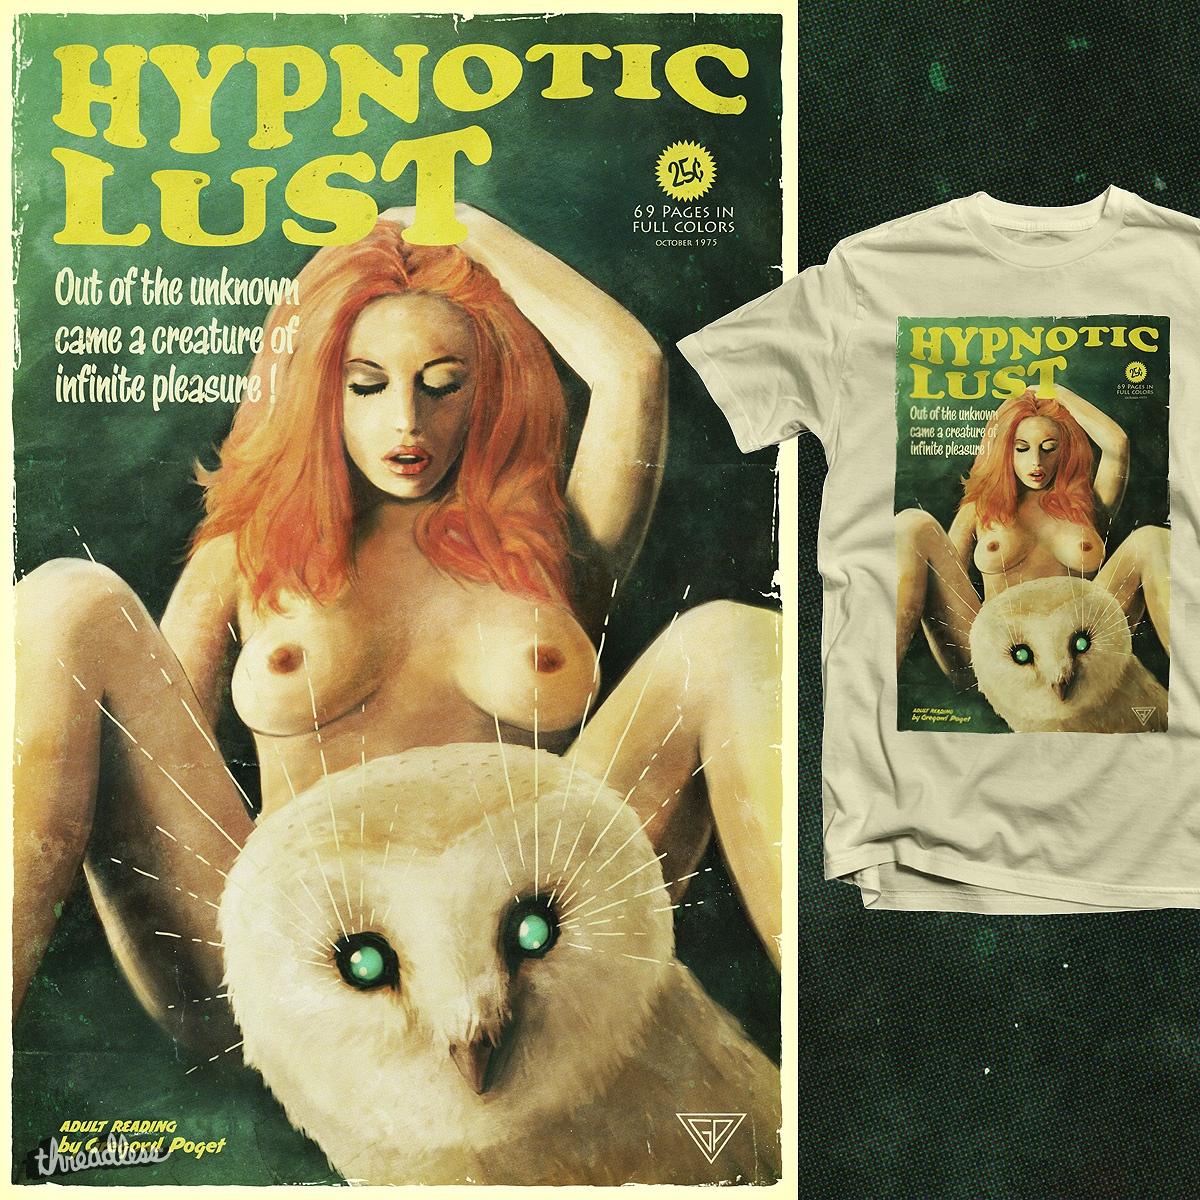 Hypnotic Lust by tetsoo on Threadless